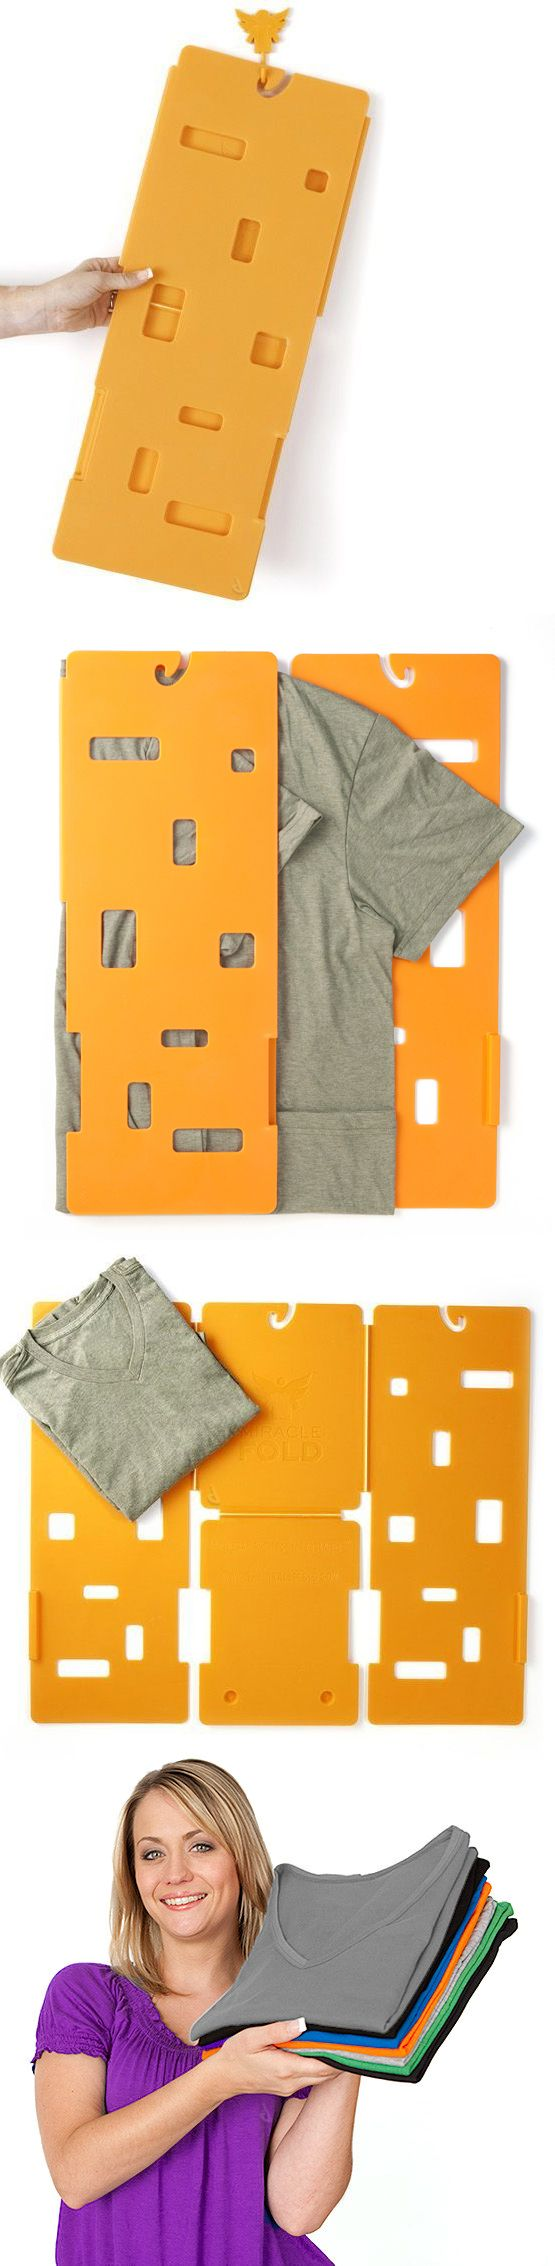 Sheldon!! Miracle Shirt Laundry Folder // Want it. Need it! Achieves the perfect folded shirt every time!.. #product_design #gadget #bigbangtheory